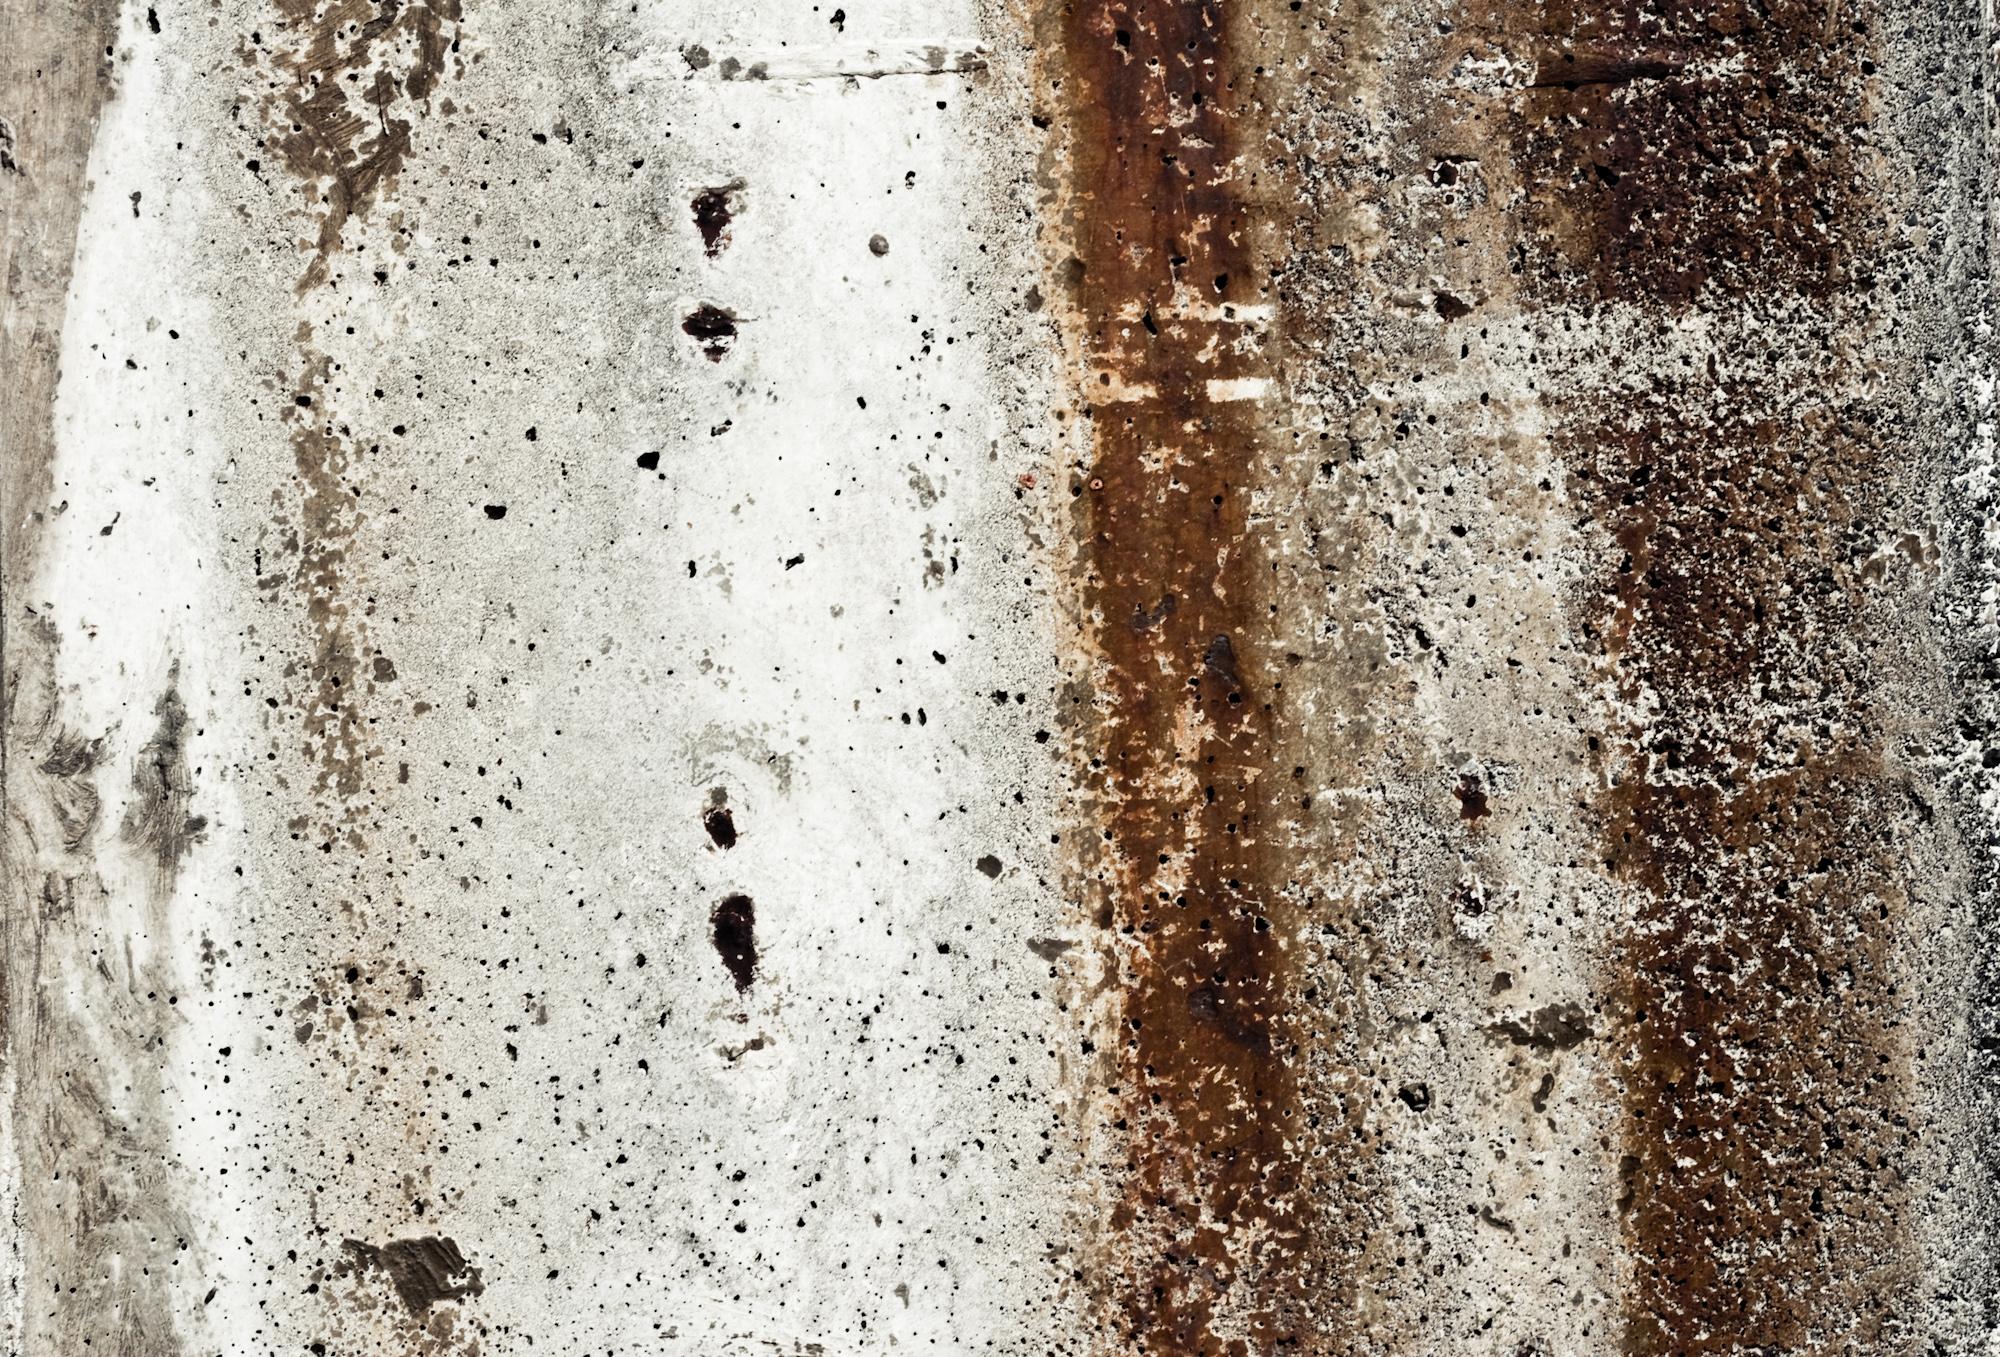 Rust Colored Stone, Concrete, Damaged, Old, Orange, HQ Photo